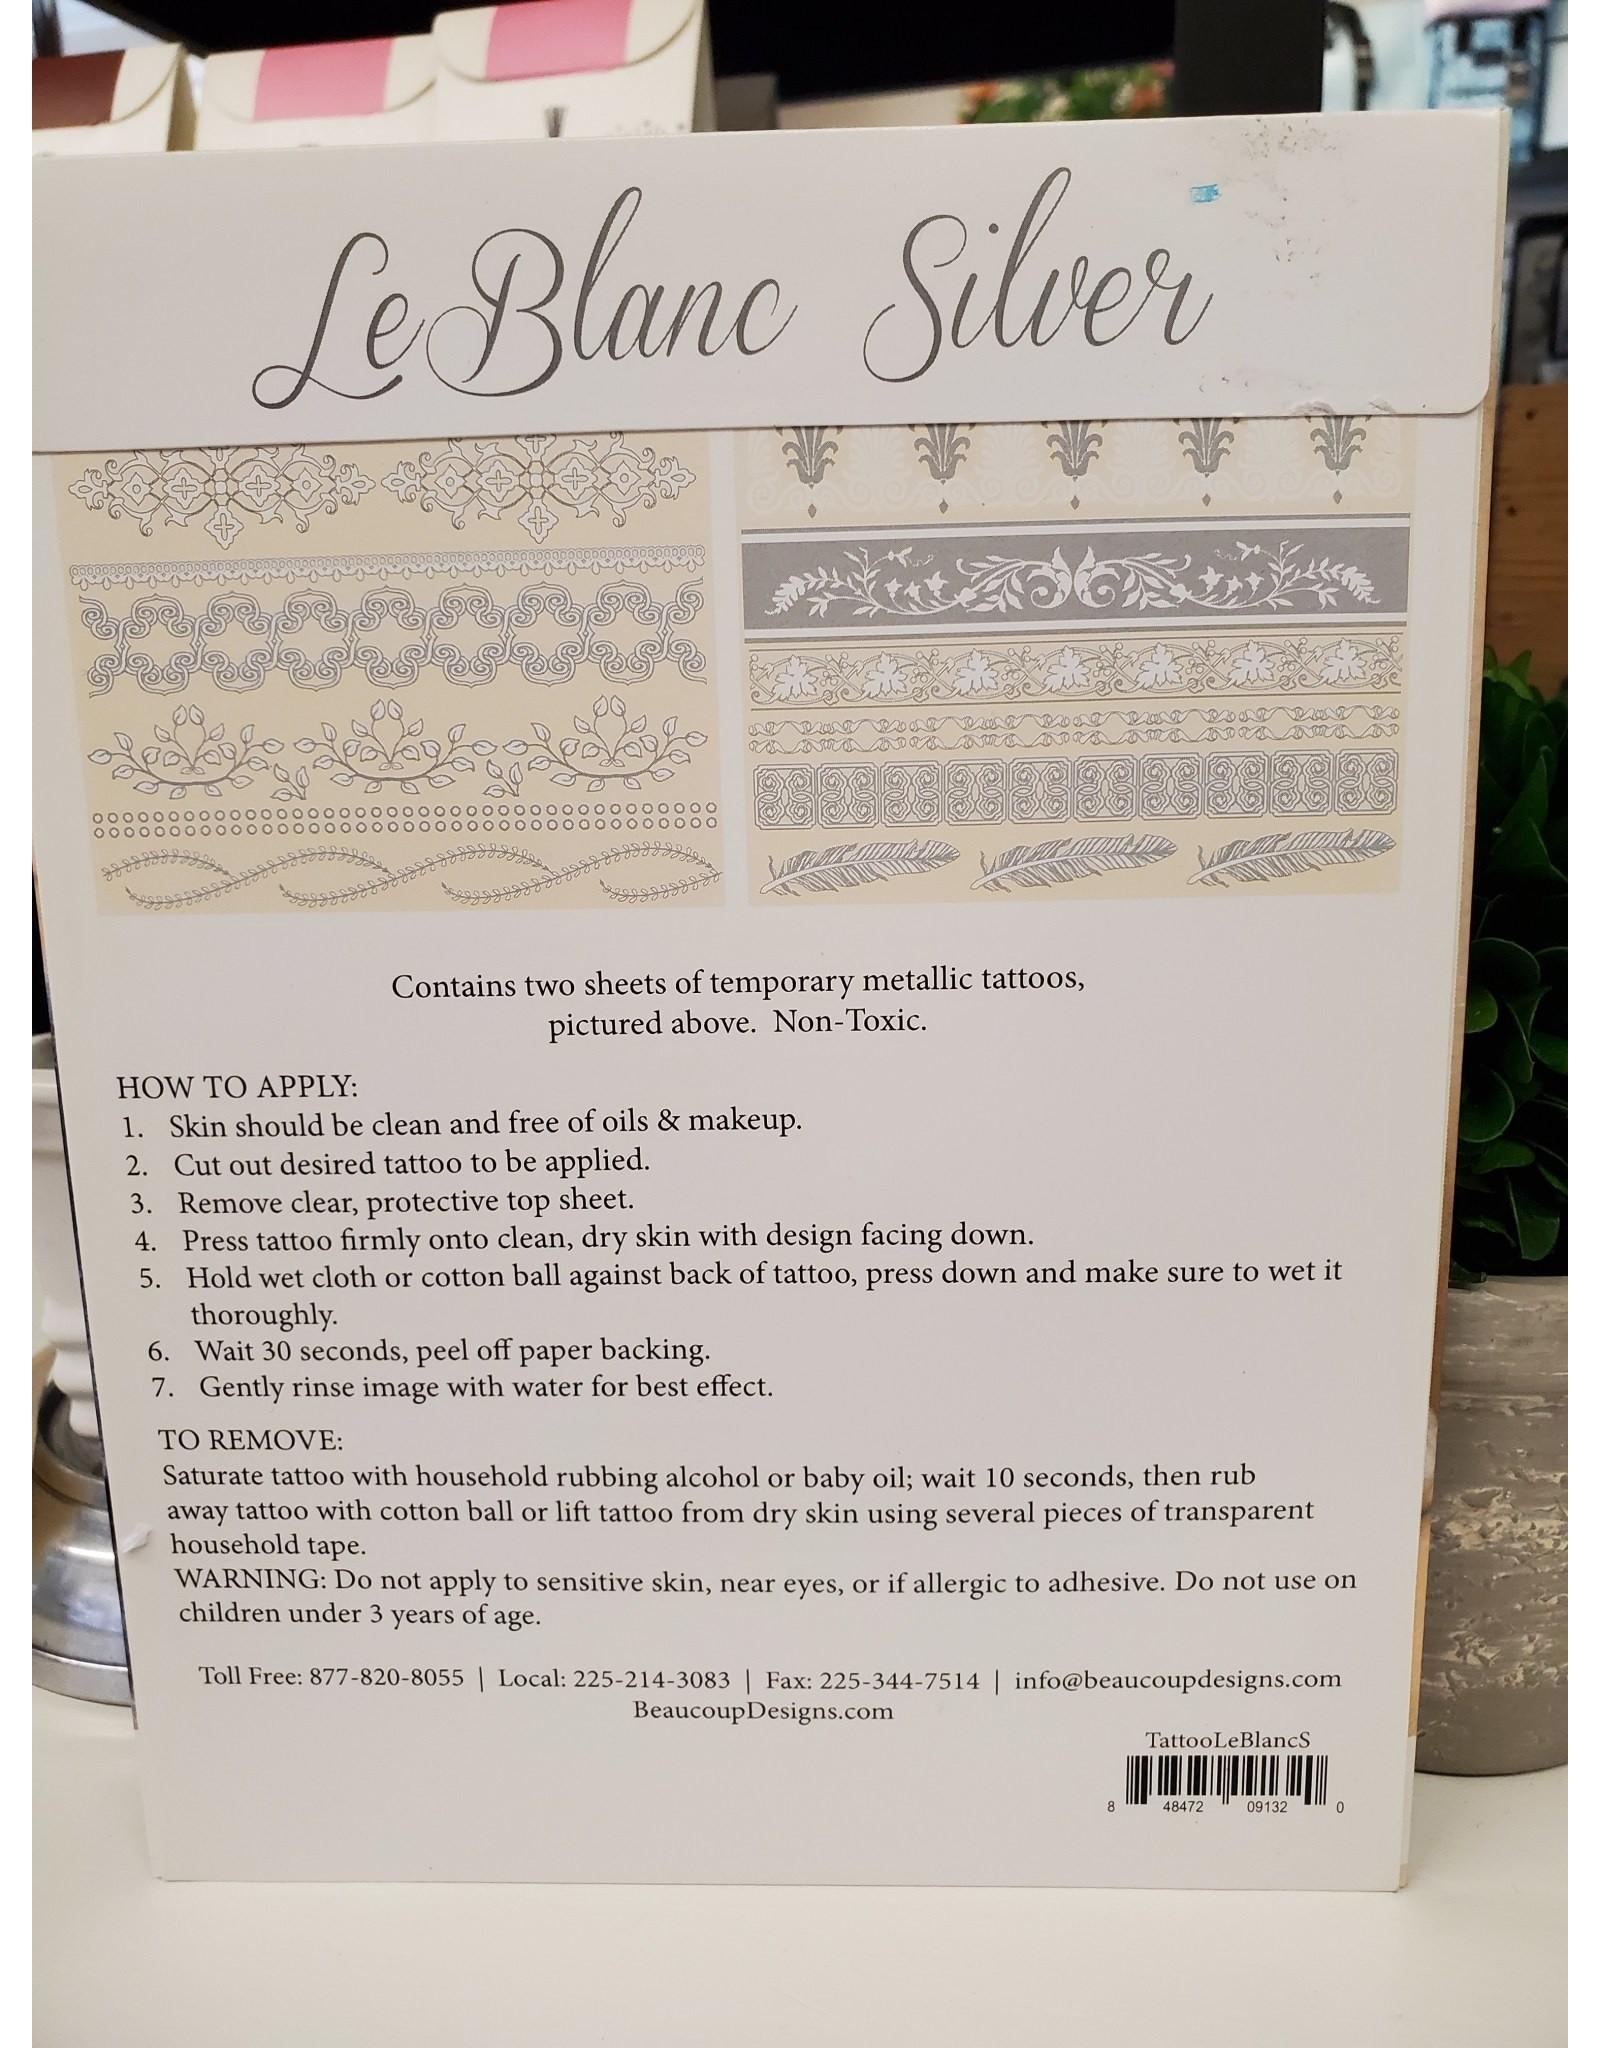 Beaucoup Designs Tattoo LeBlanc Silver